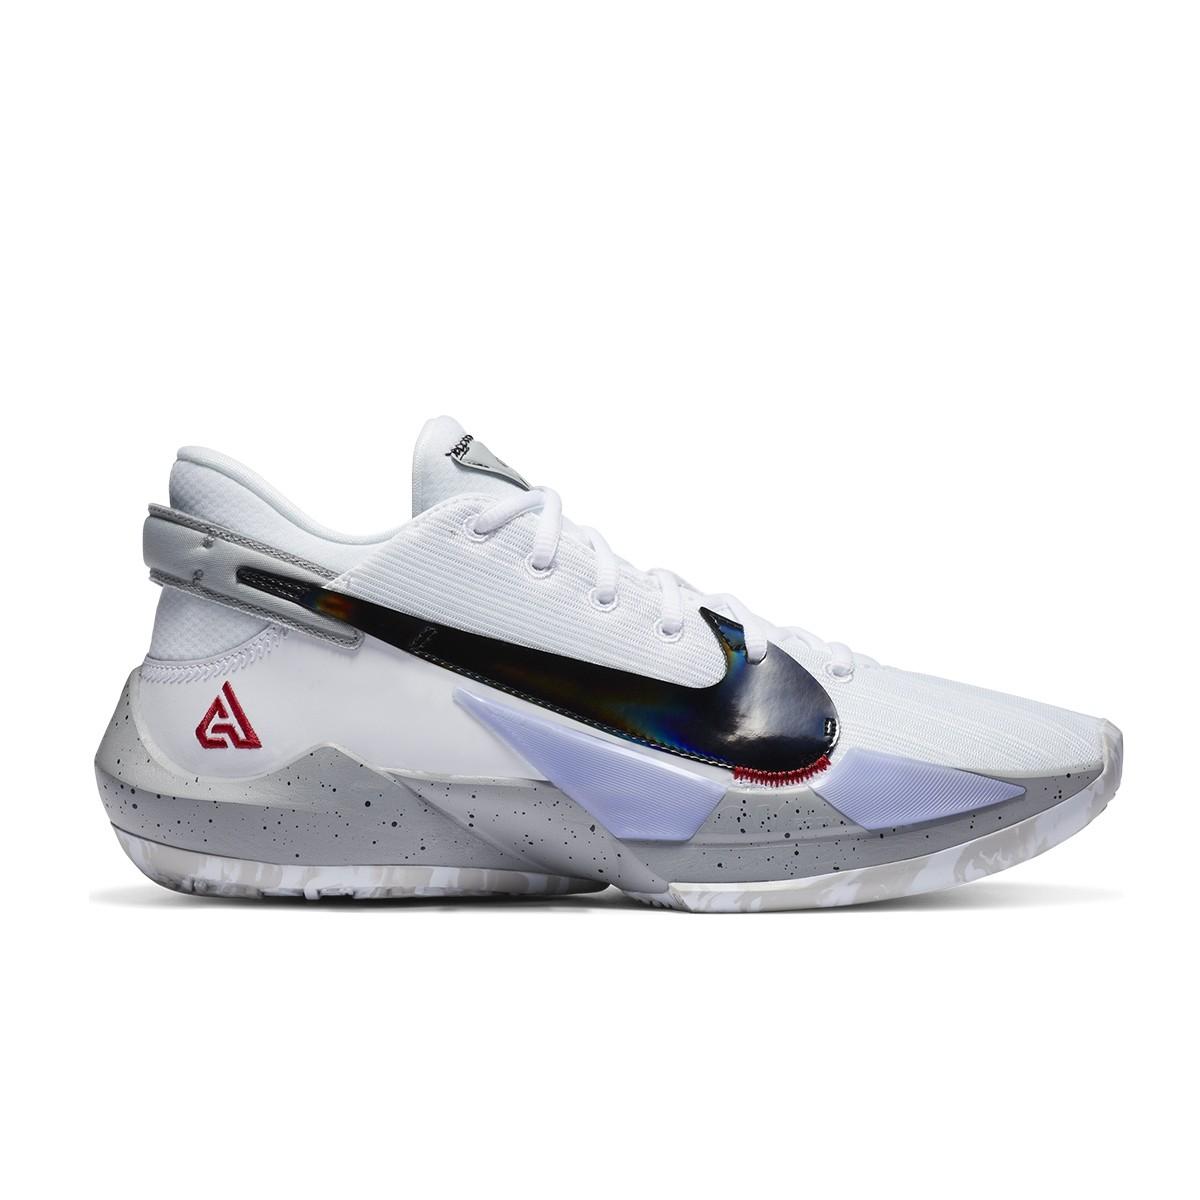 Nike Zoom Freak 2 'White Cement'